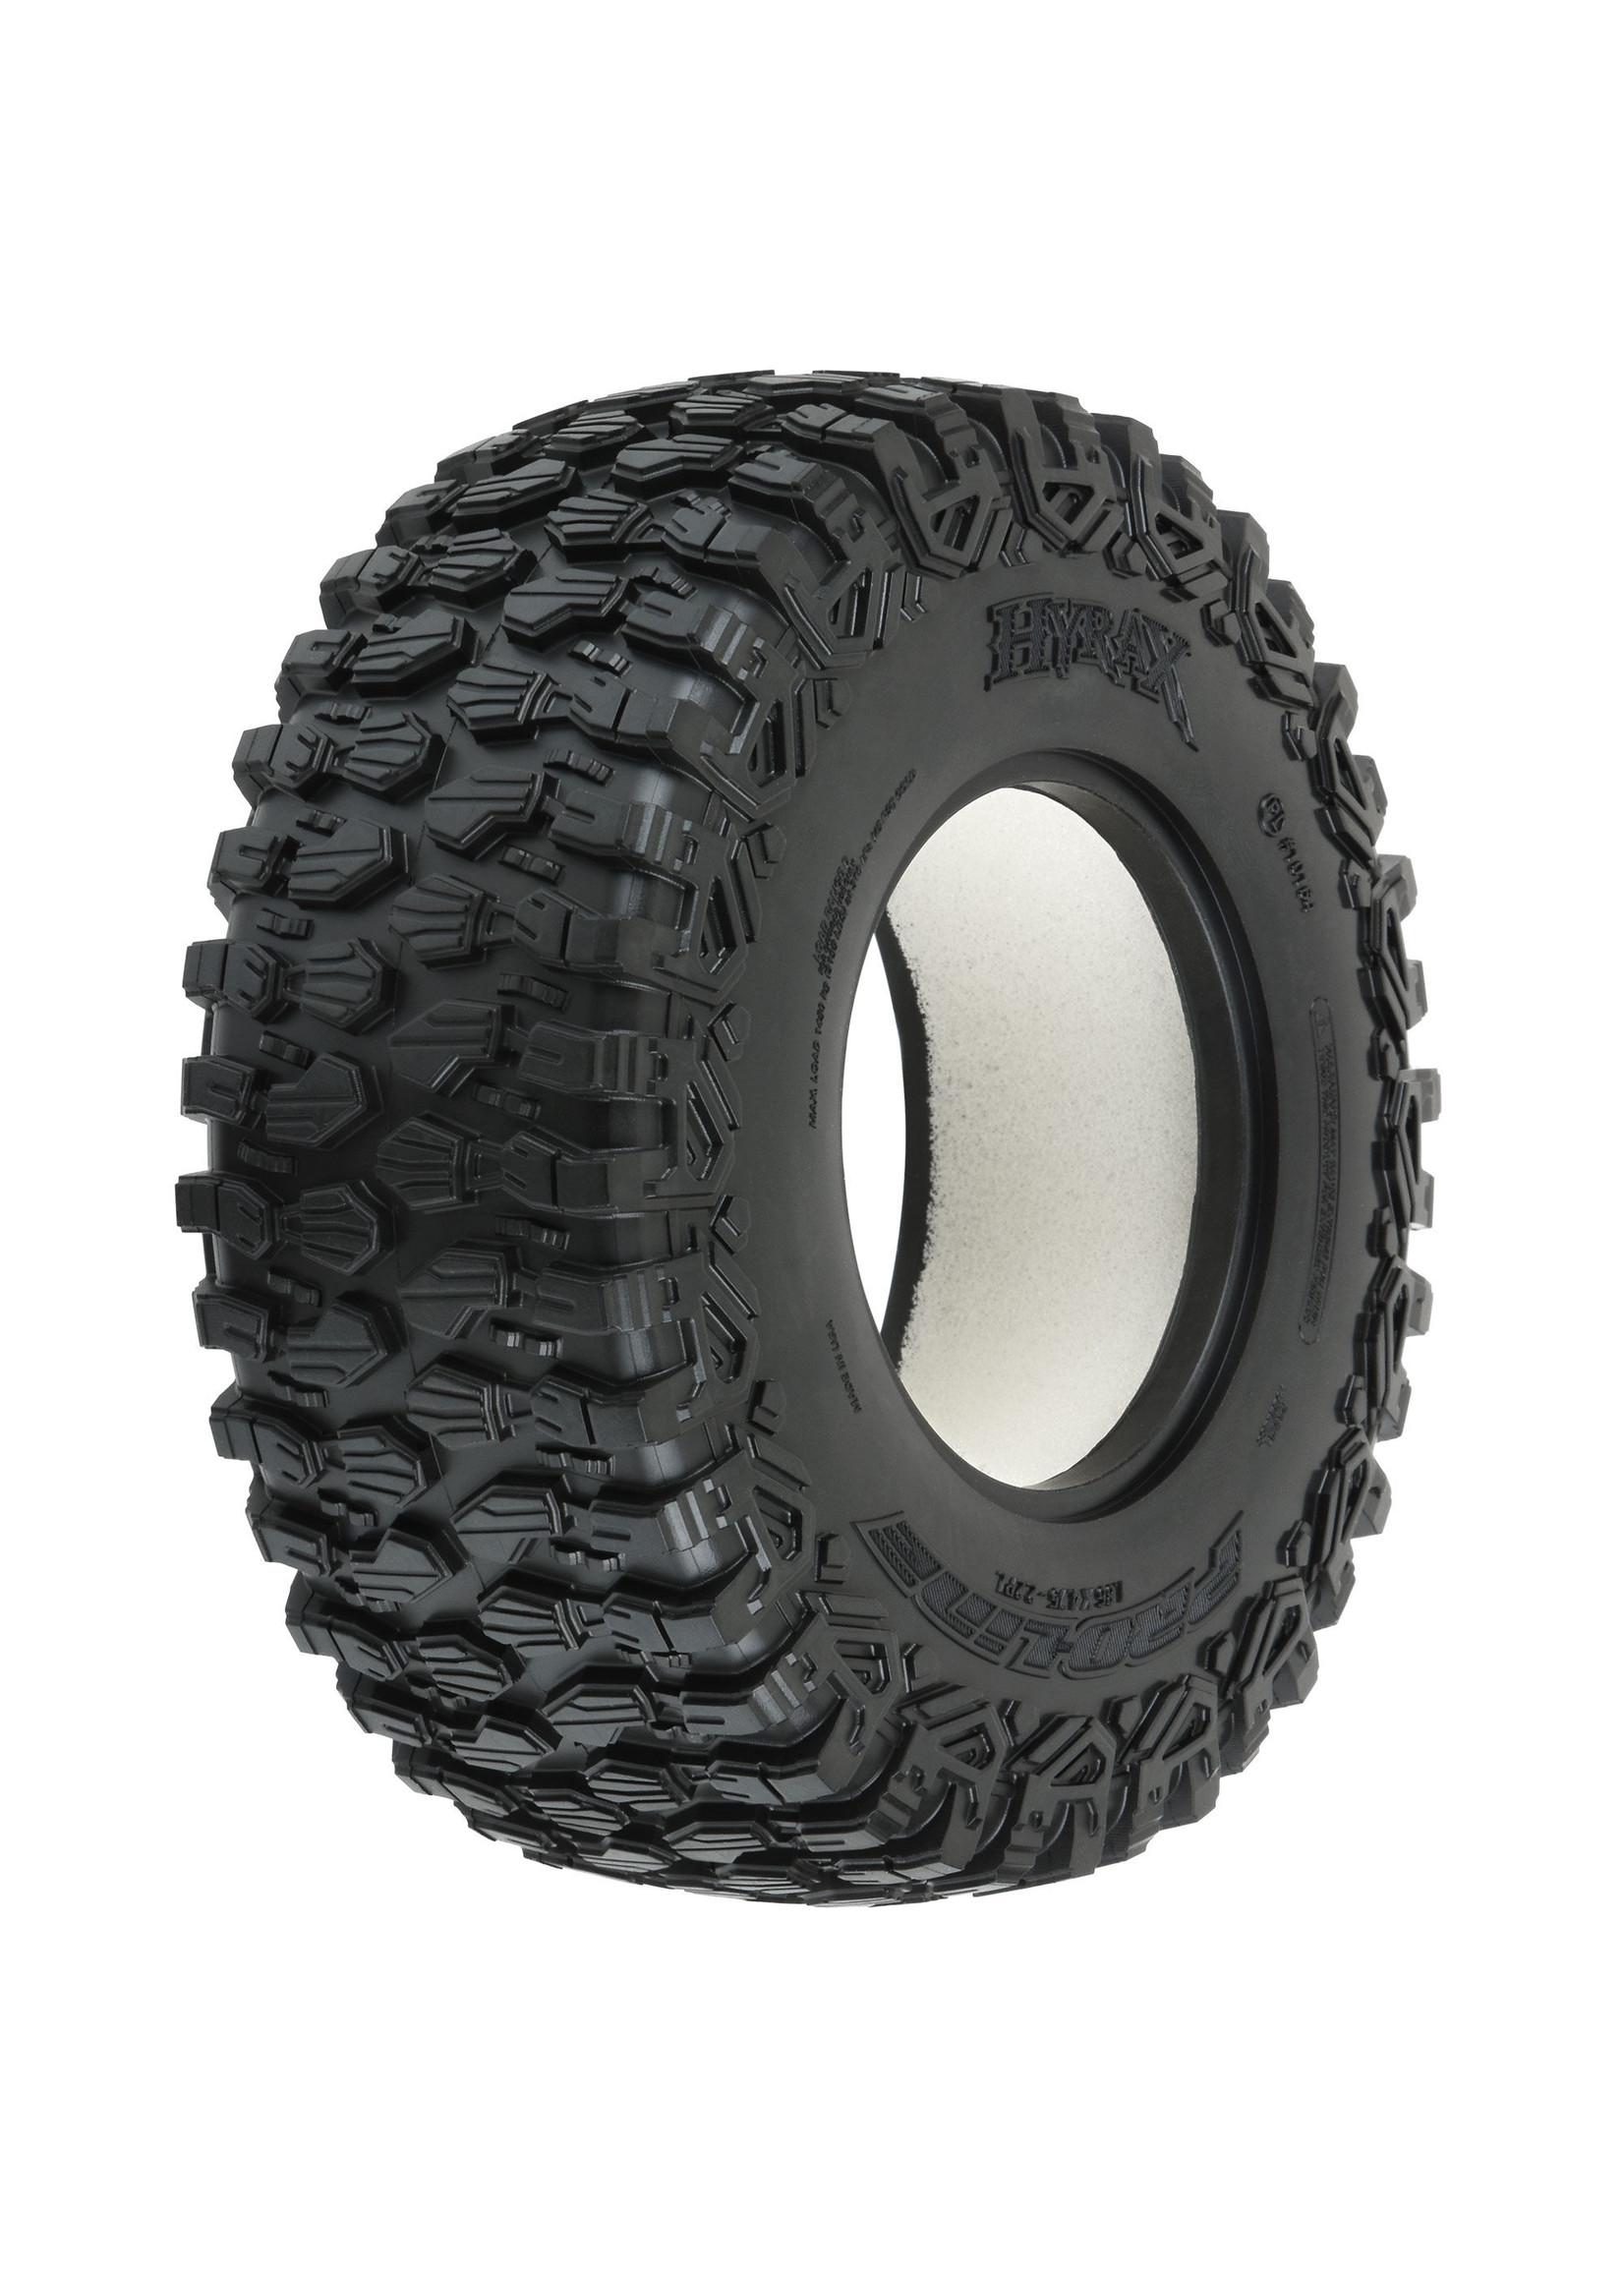 Pro-Line Racing PRO10164-00 Pro-Line Hyrax SCXL 2.2/3.0'' M2 All Terrain Tires, for Desert & SC